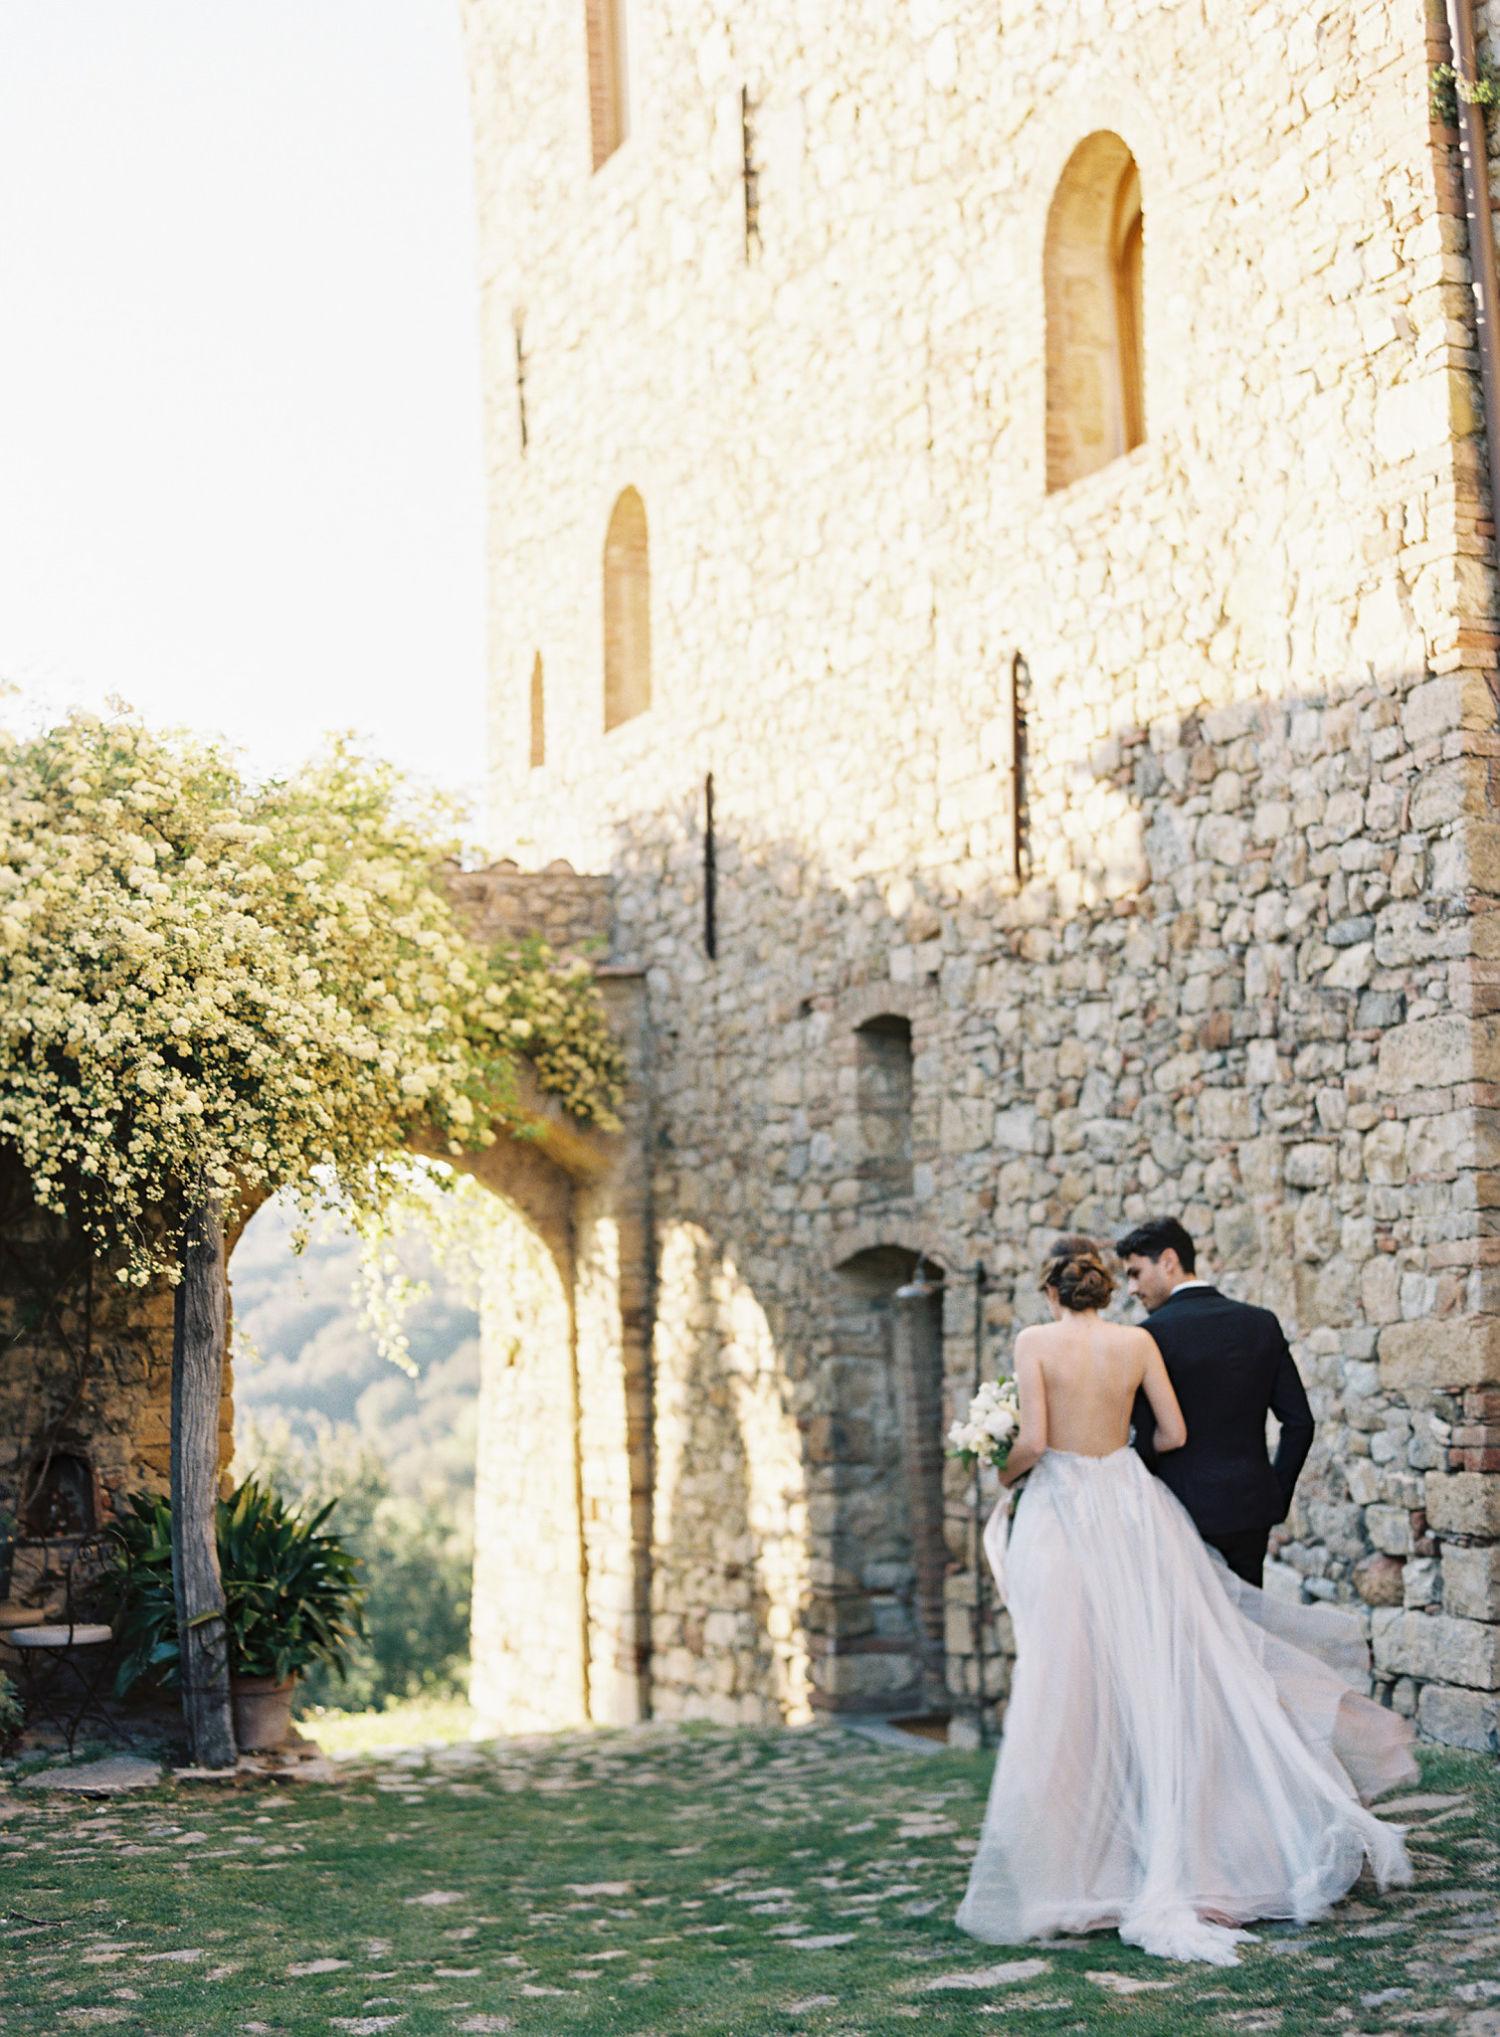 Taylor&Porter_CastilloDeVicarello_ItalyWedding_141_opt.jpg